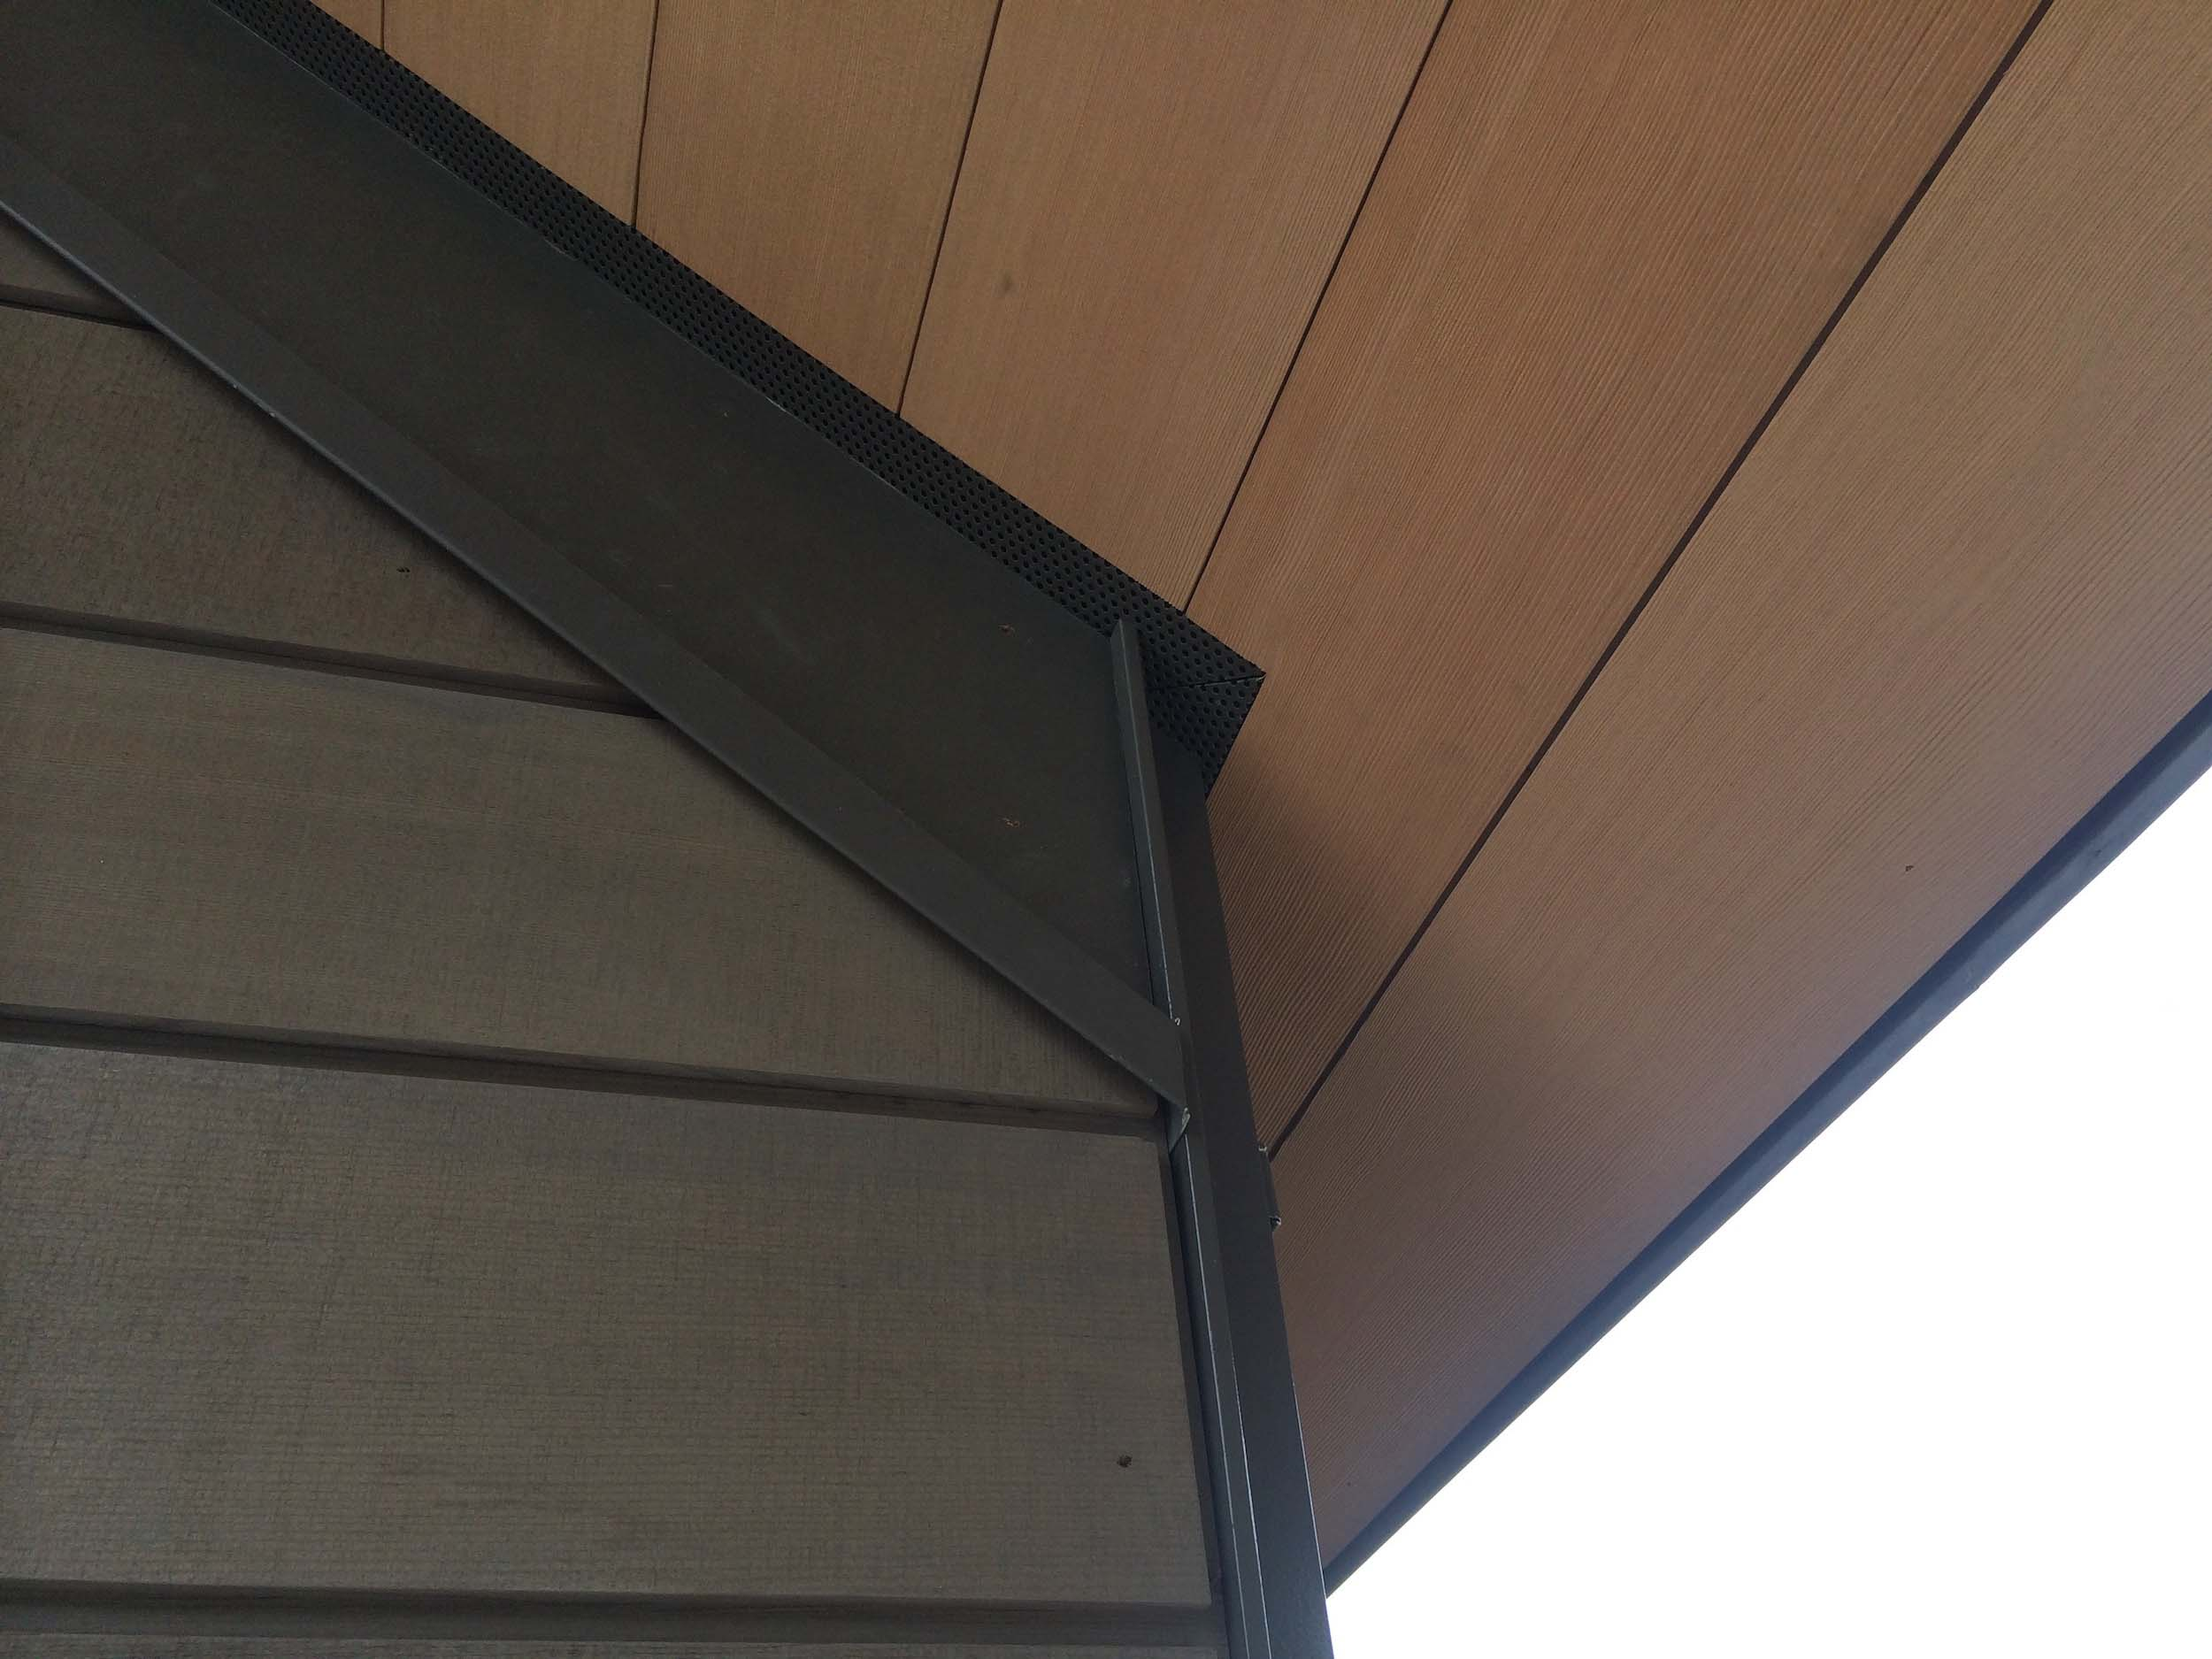 Postle_Construction_ExteriorCladding11.jpg